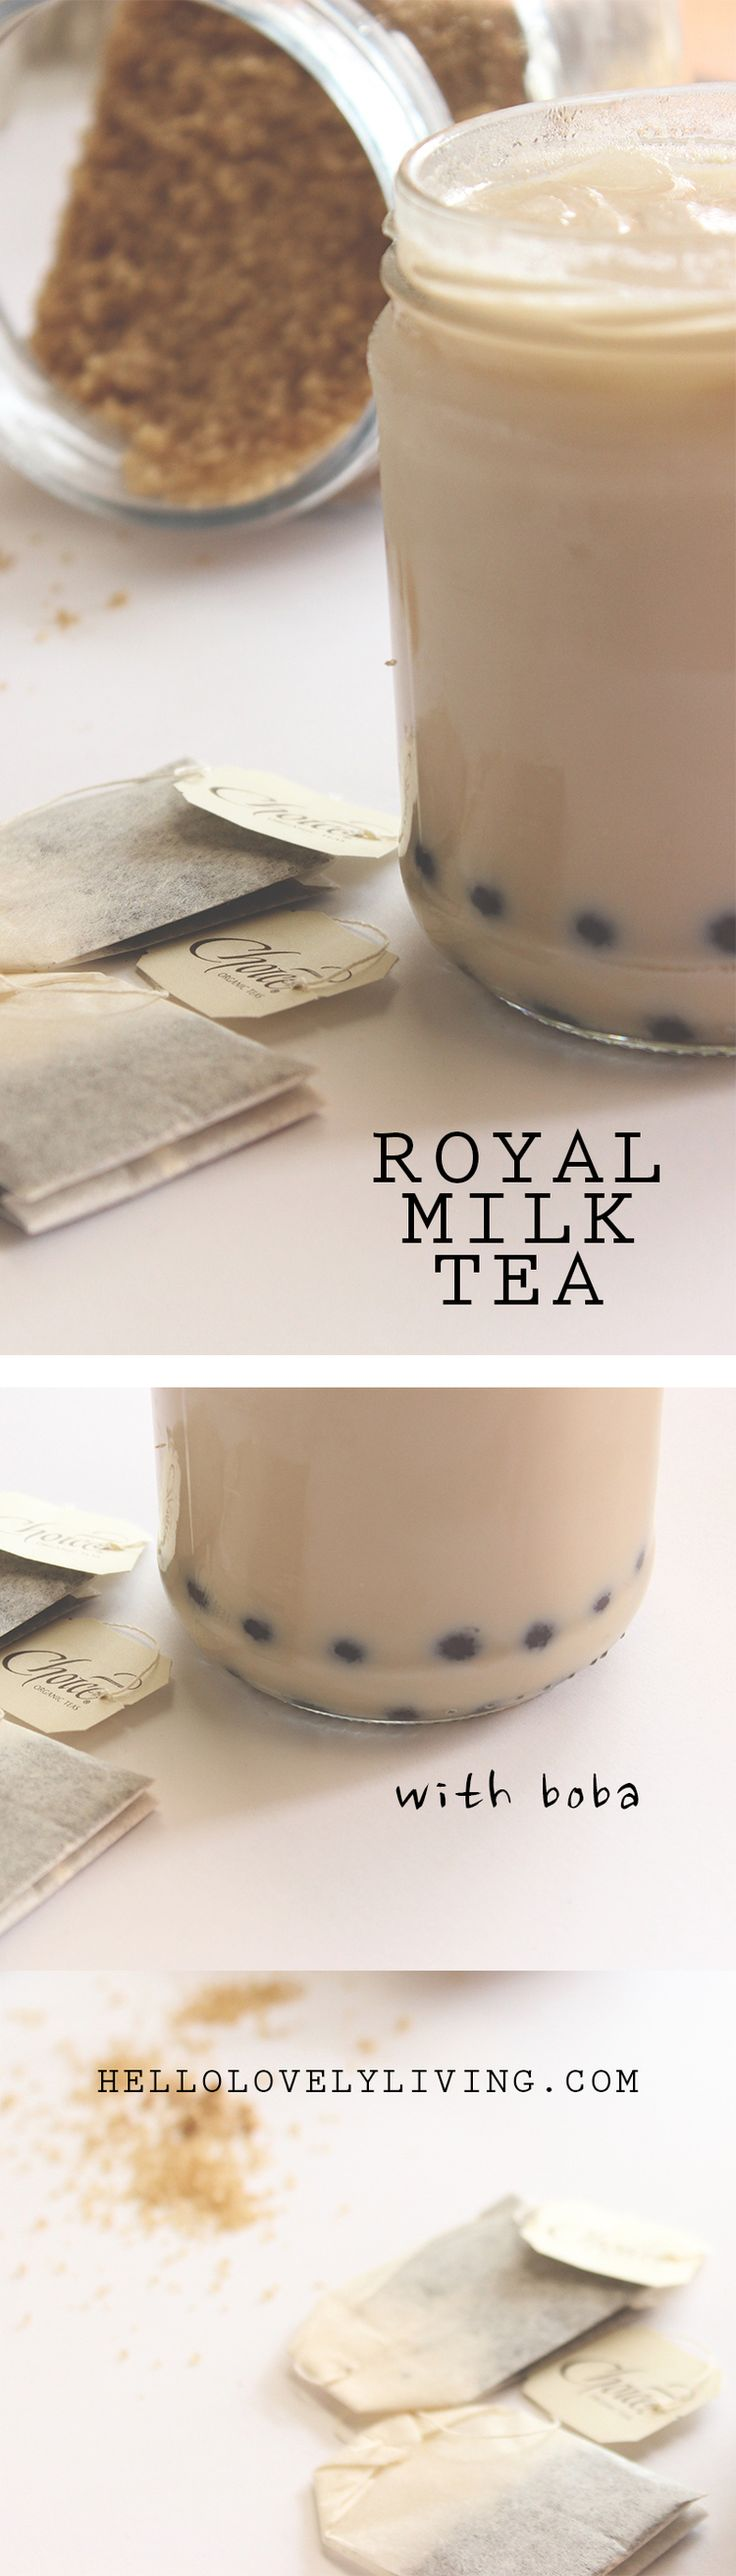 how to make boba for tea